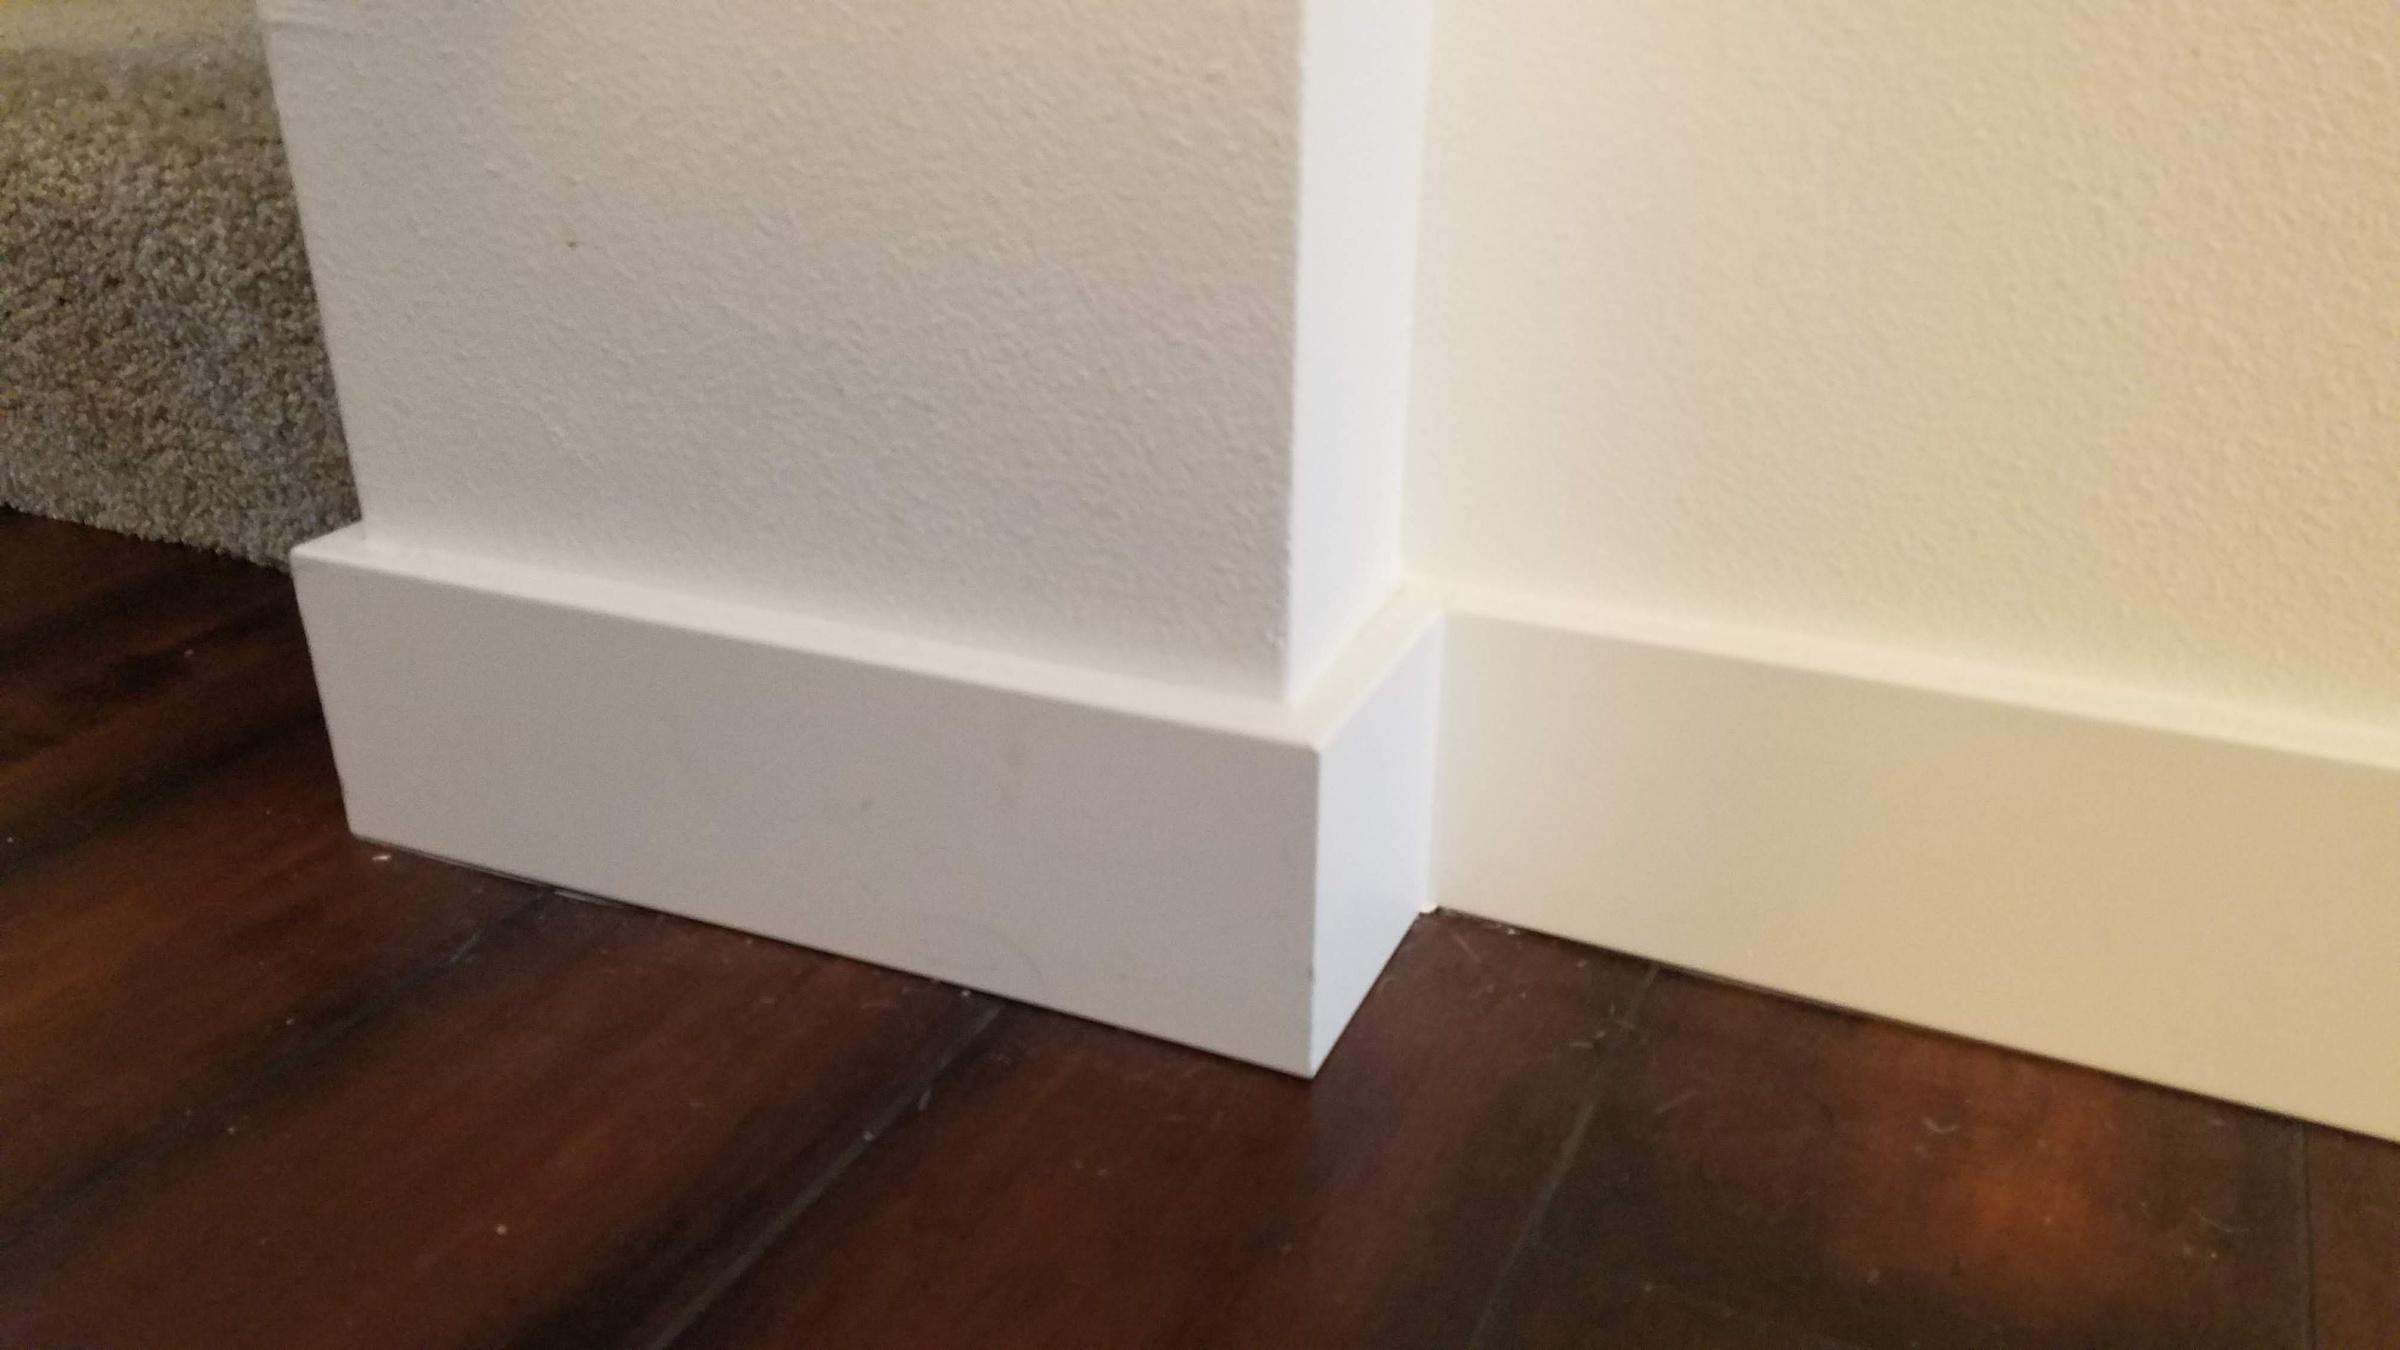 Base Molding MDF or wood? buy or cut?-20181025_114152.jpg